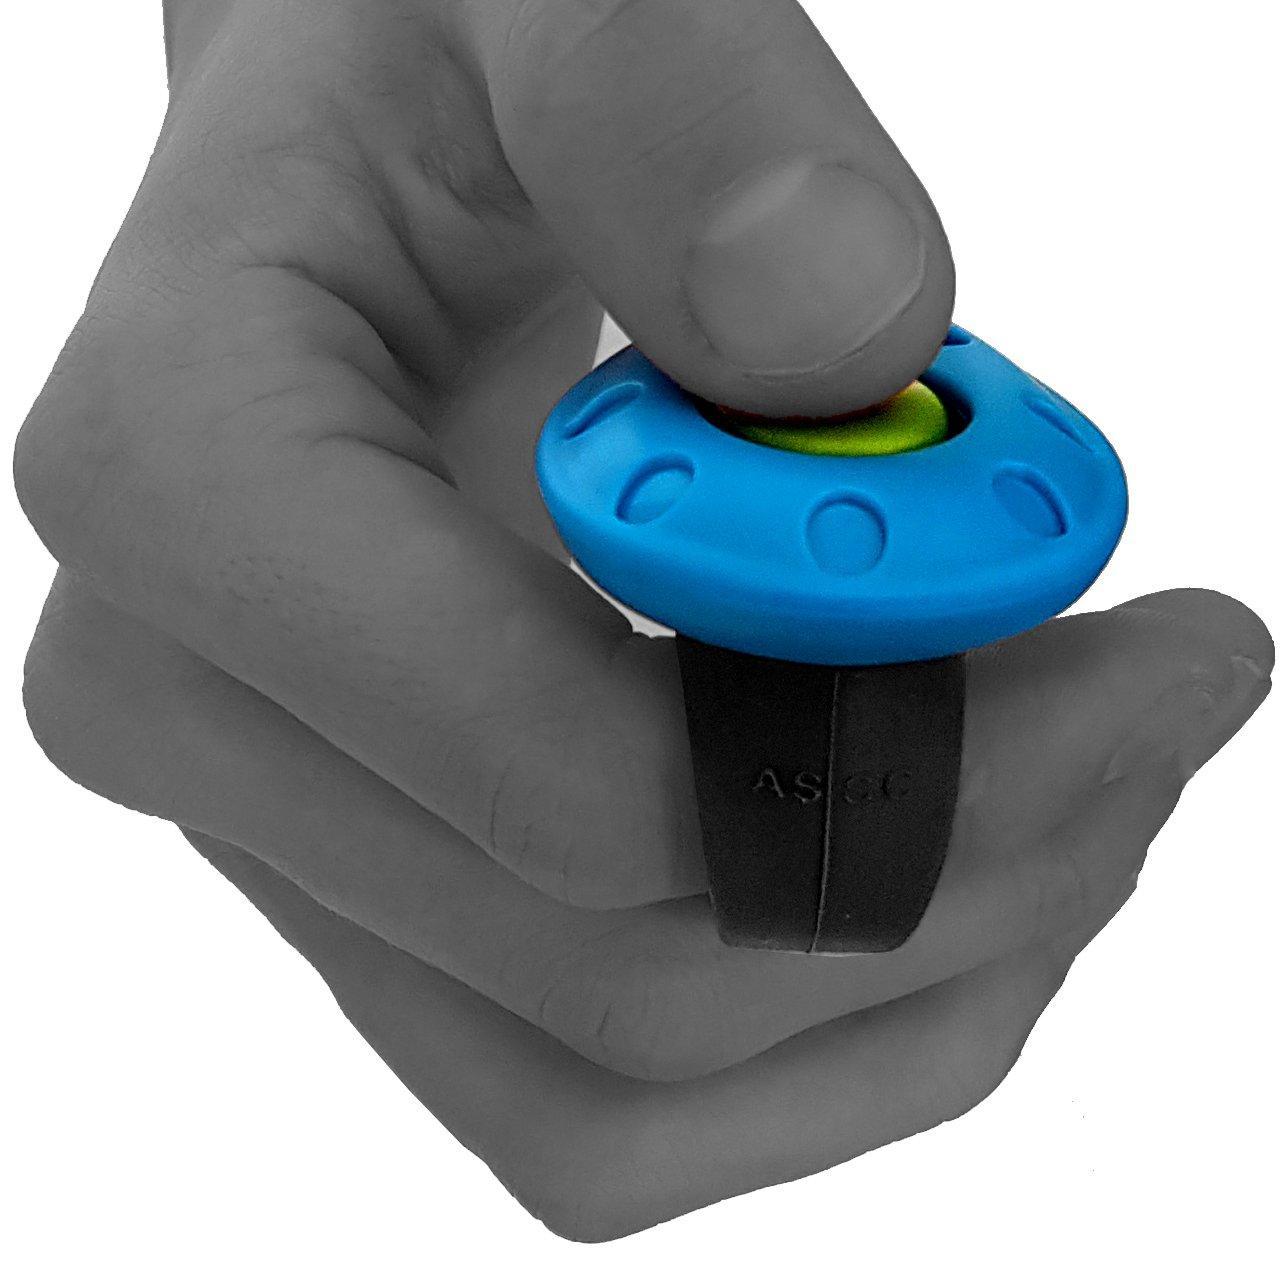 blue AC04F2X Ergonomic Quality Training Clicker ASCO 2x Premium Clicker PET Dog Puppy Cat Horse Finger Clicker Pack of 2